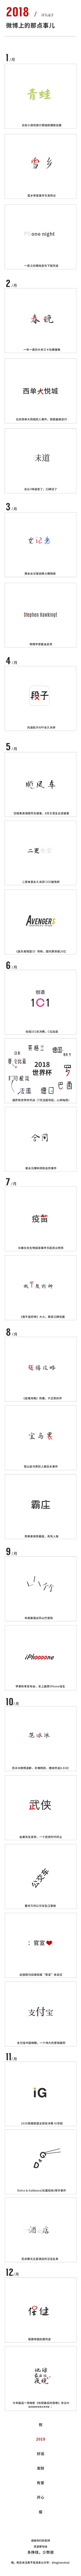 www.taoshu6.com_2018年微博热门盘点,细数你错过了那些热点事件 taoshu6.net淘书楼淘福利 第1张